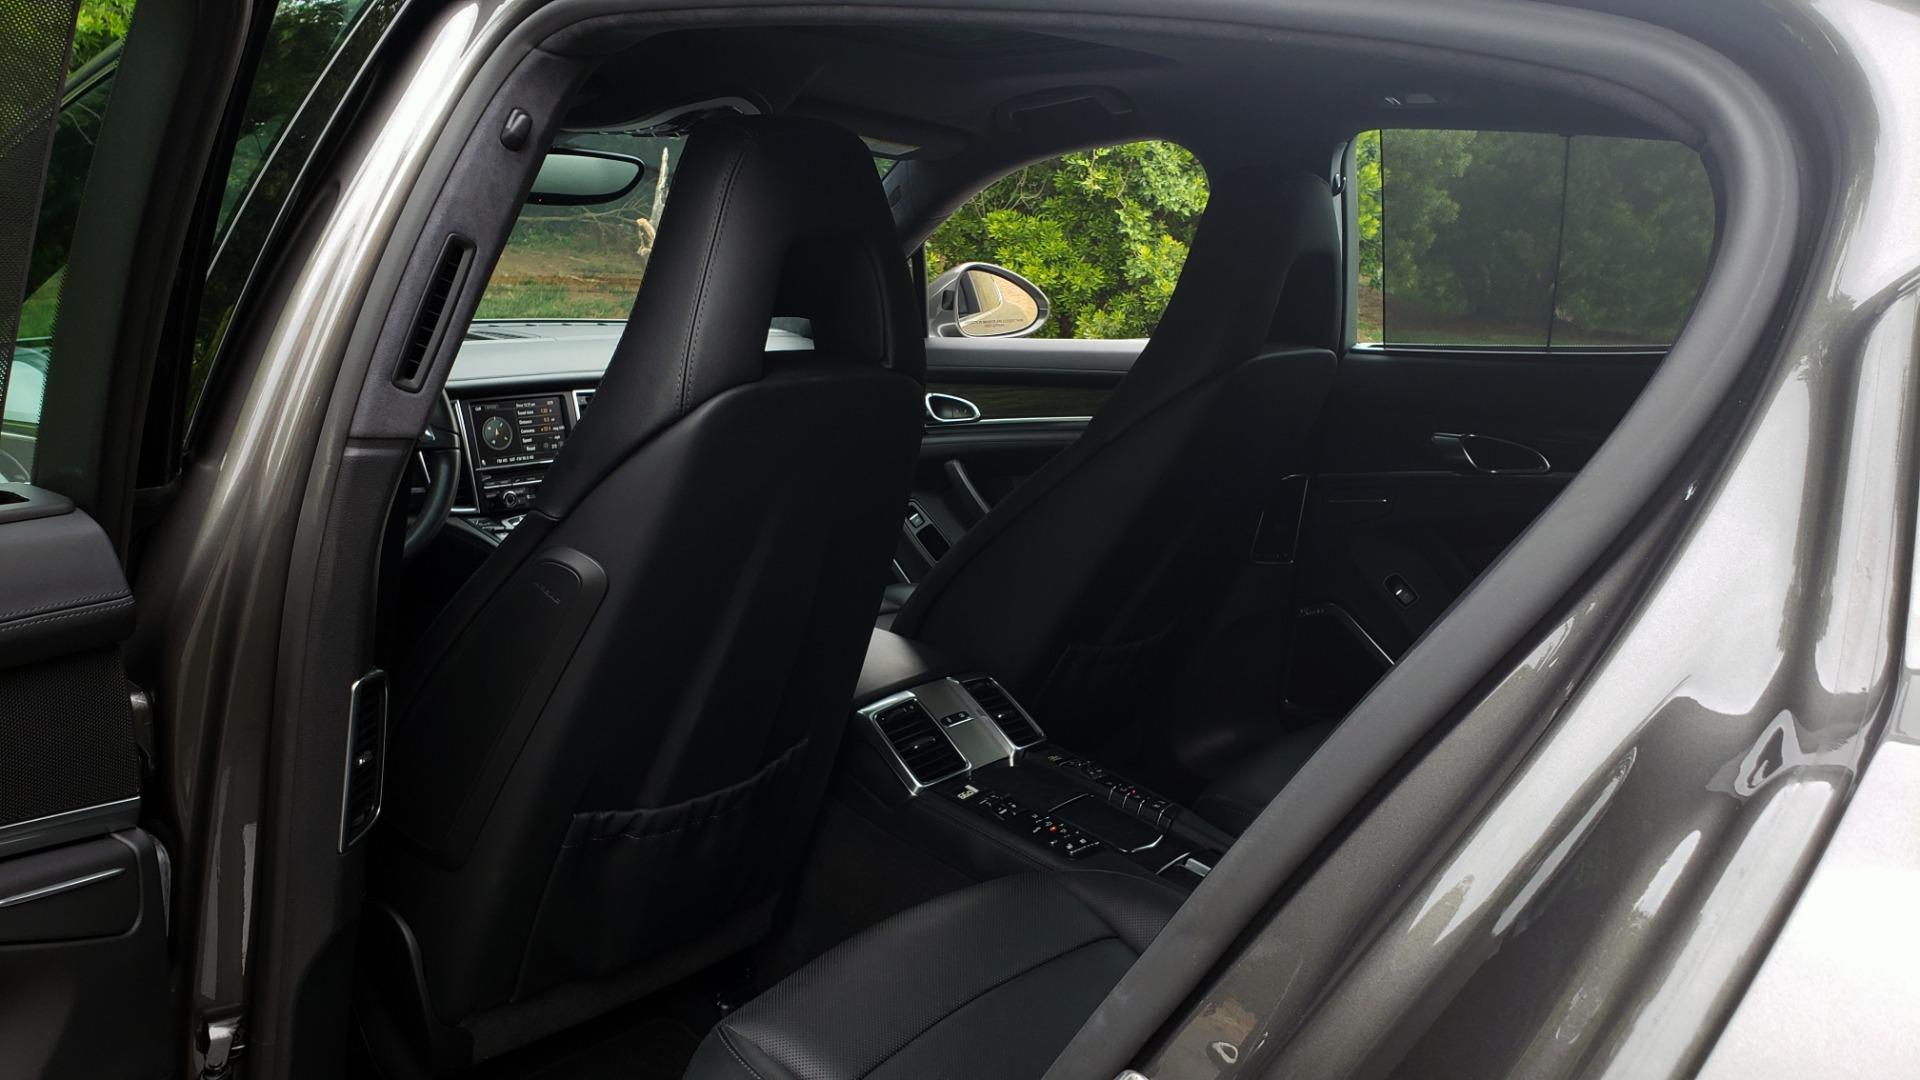 Used 2013 Porsche PANAMERA TURBO 4.8L V8 / AWD / NAV / SUNROOF / LCA / PARK ASST / BURMESTER for sale $45,995 at Formula Imports in Charlotte NC 28227 64